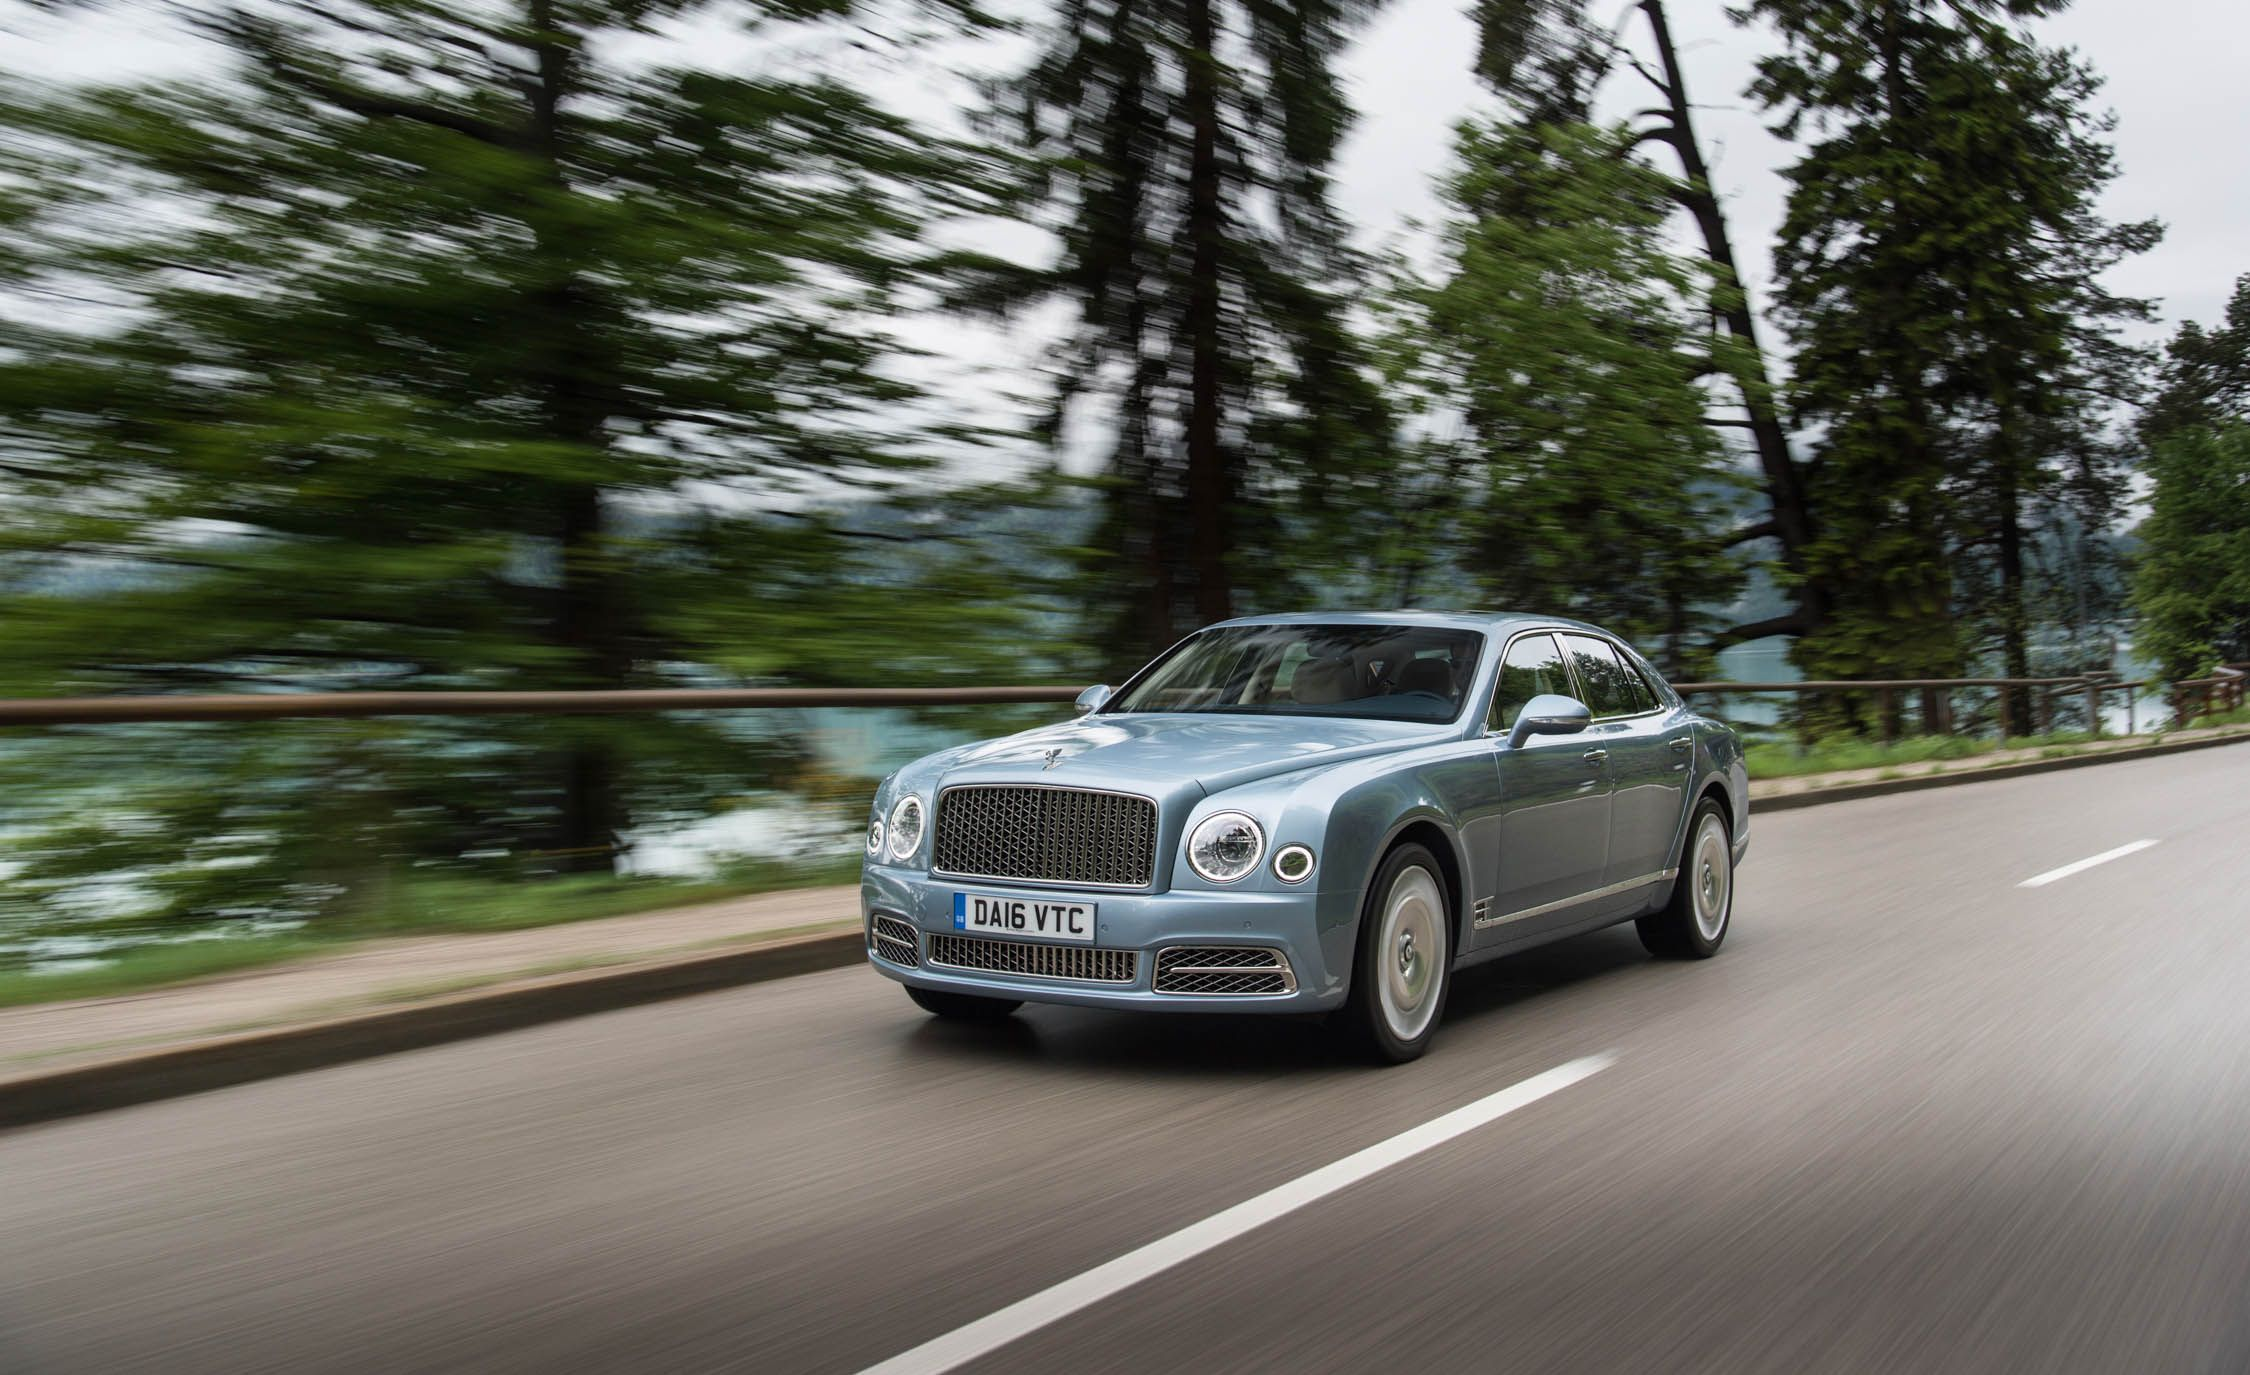 express rover bentley price bentayga cars vs of auto twin range